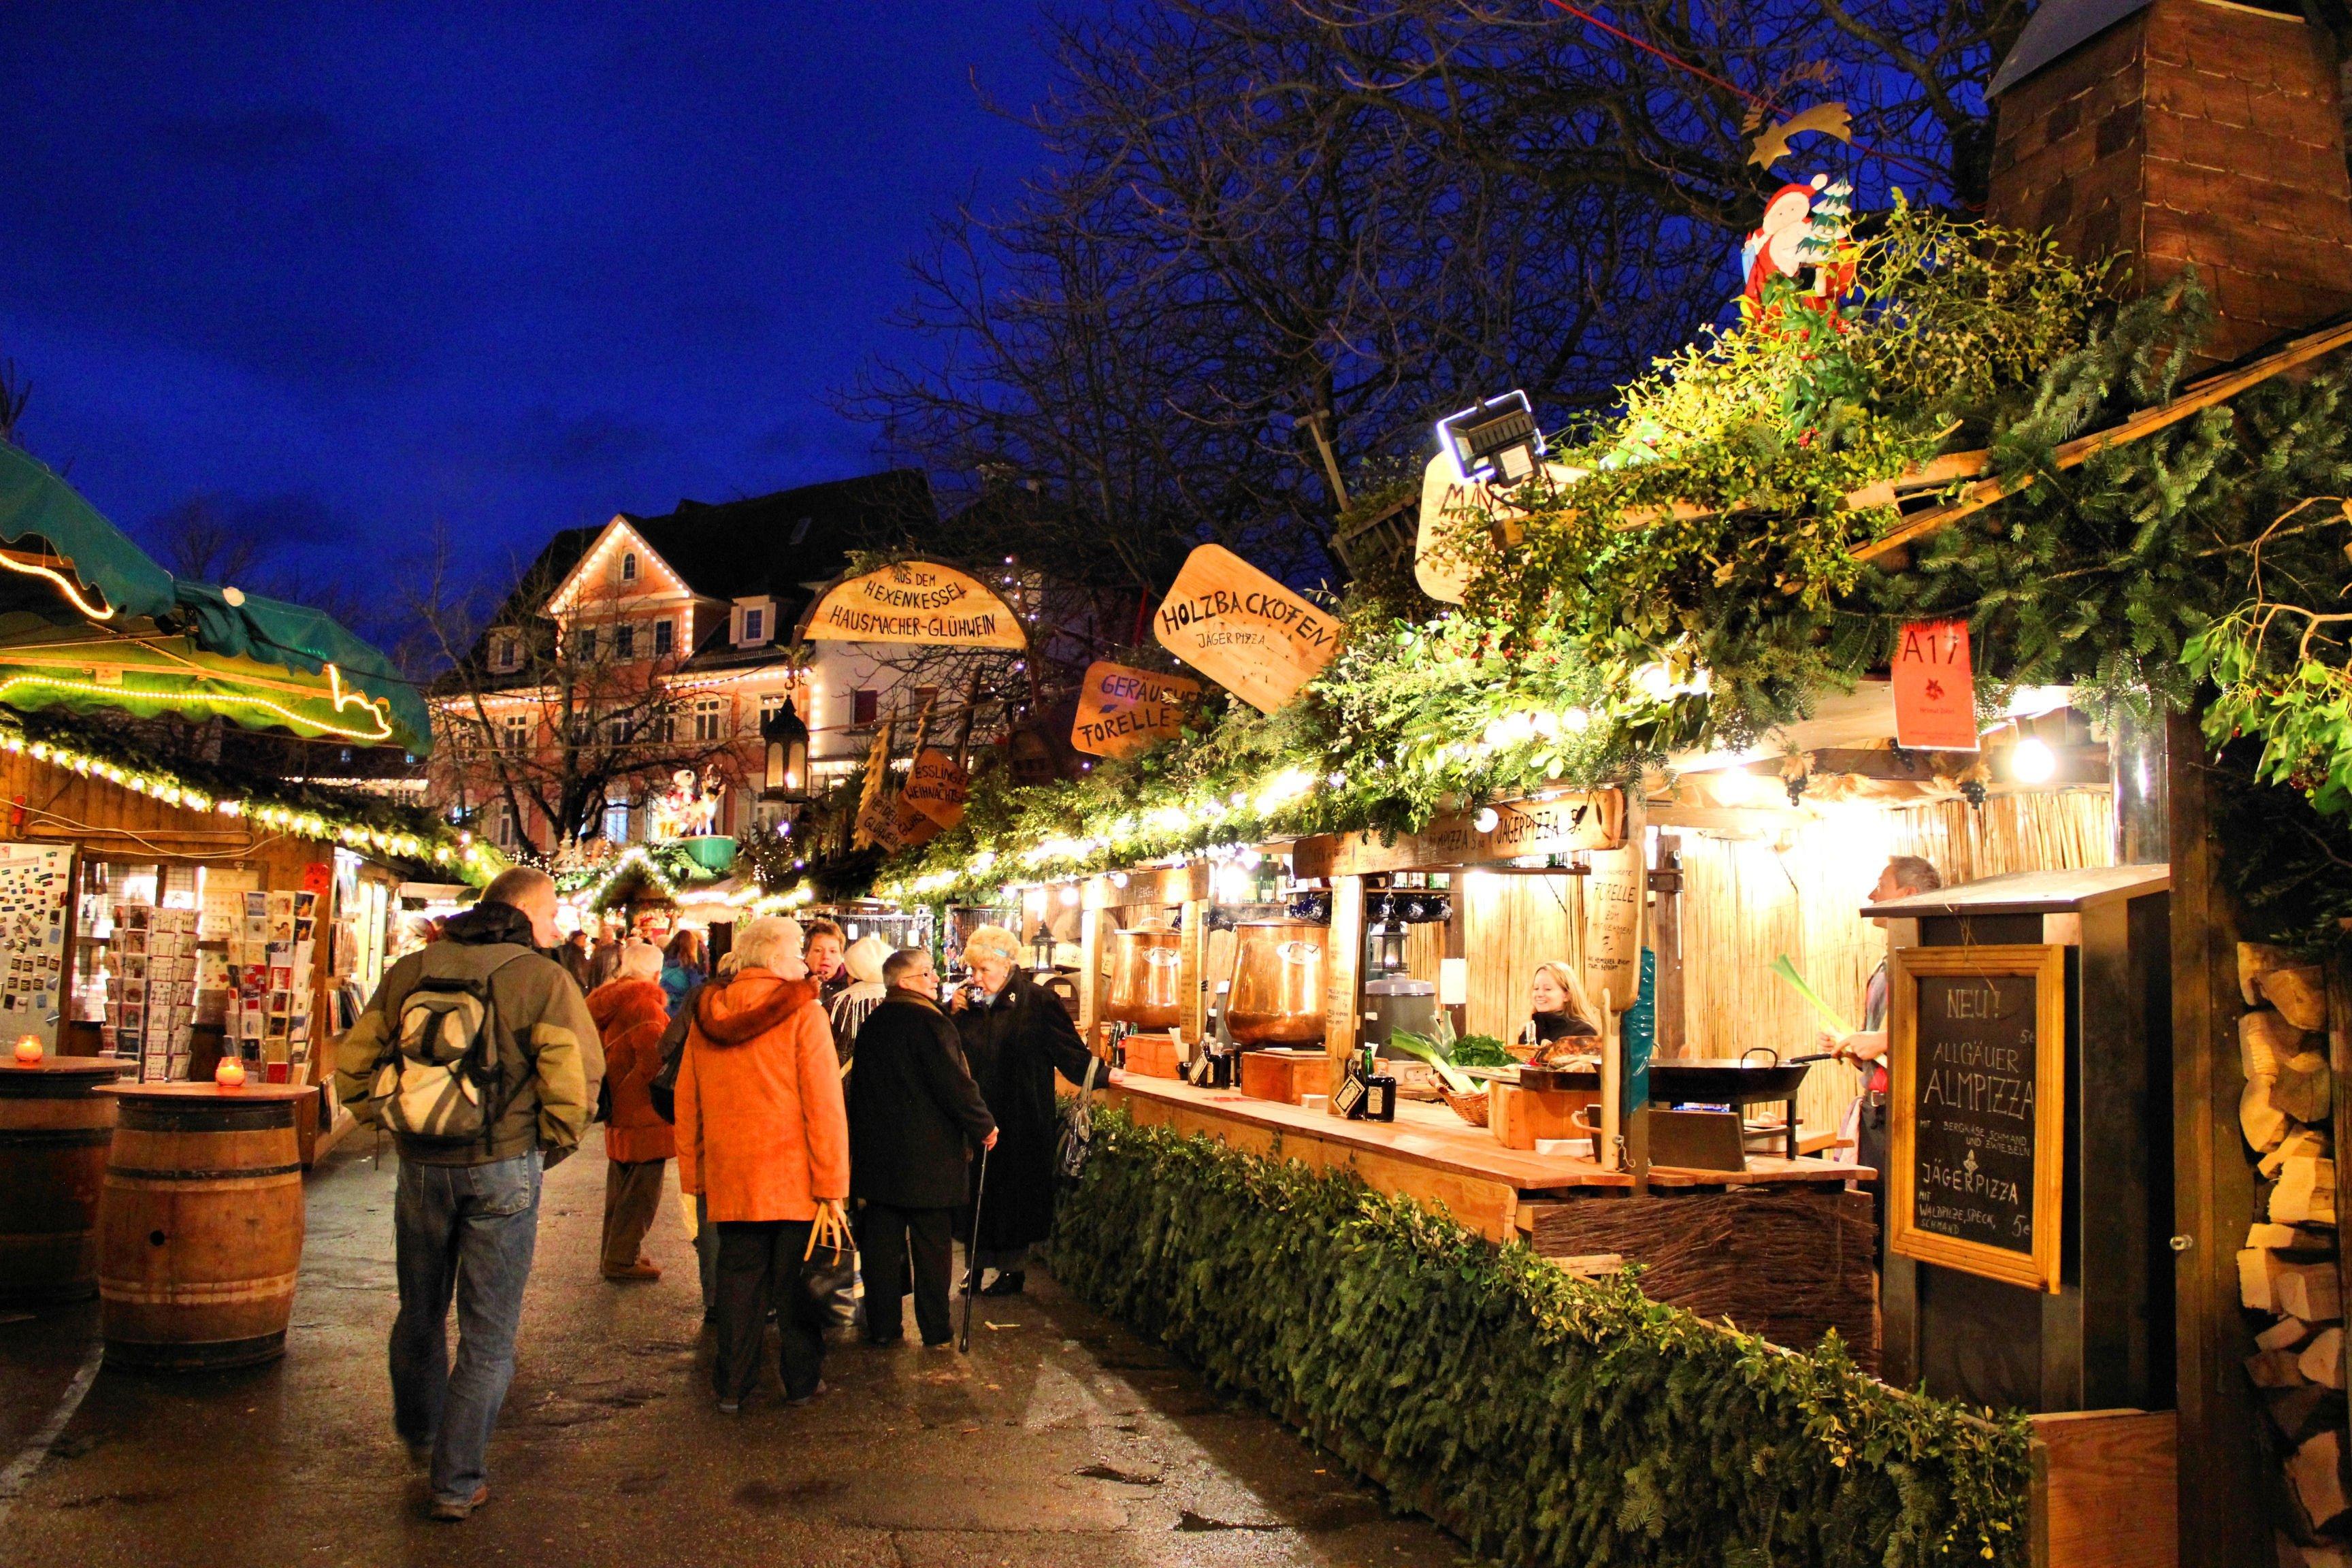 esslingen christmas market.jpg?resize=1200,630 - 《歐洲嘉年華、德國啤酒節》台北101限時登場!集結11國歐陸主題美食小帳篷!